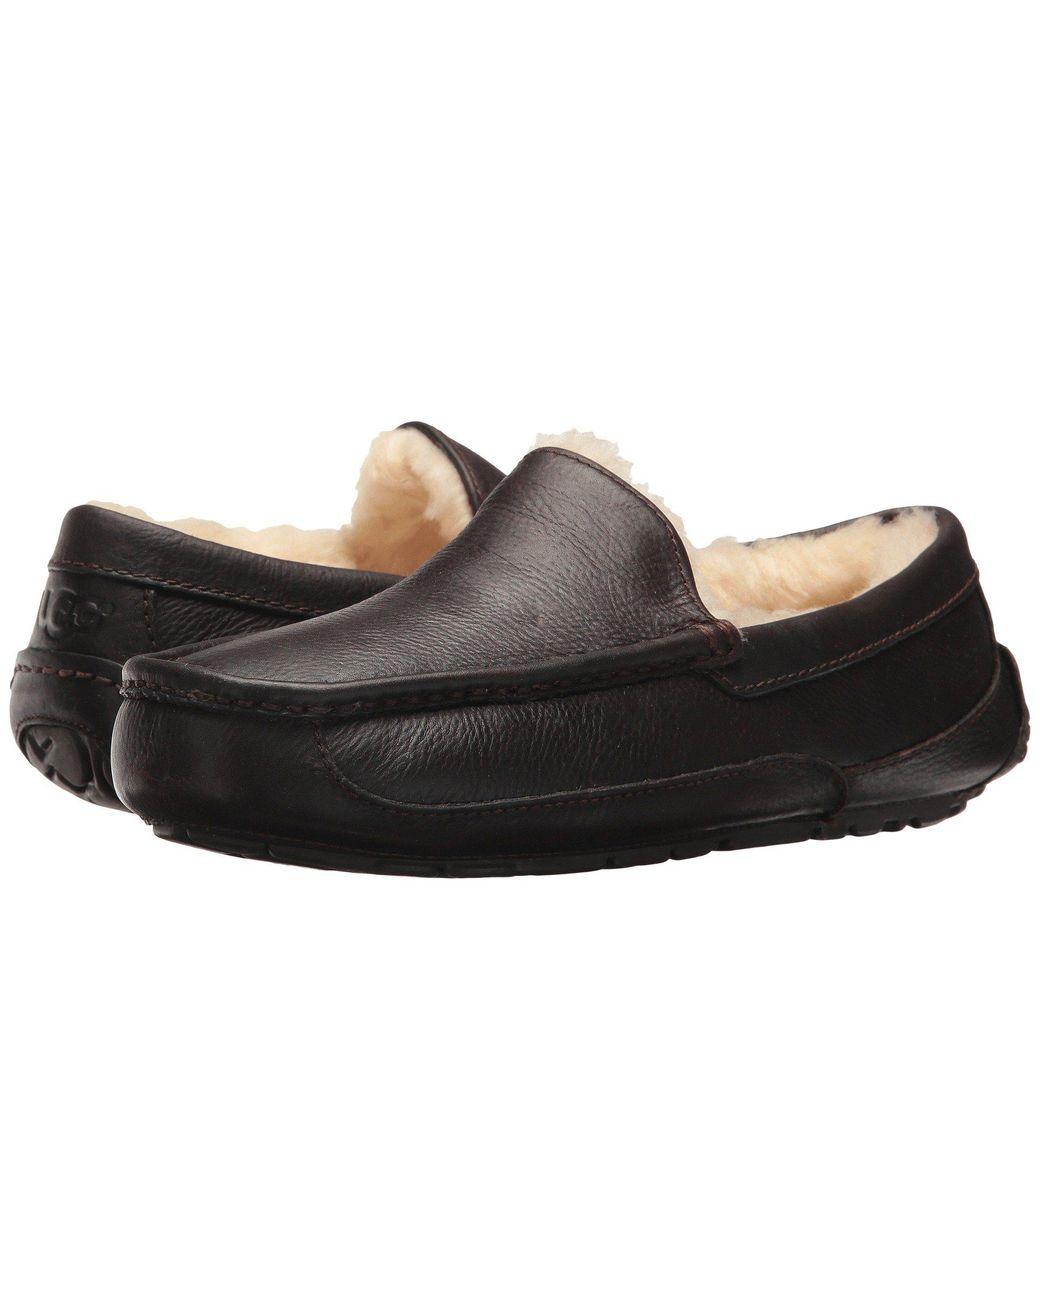 adabf094d7c Men's Brown Ascot Grain Leather Slippers